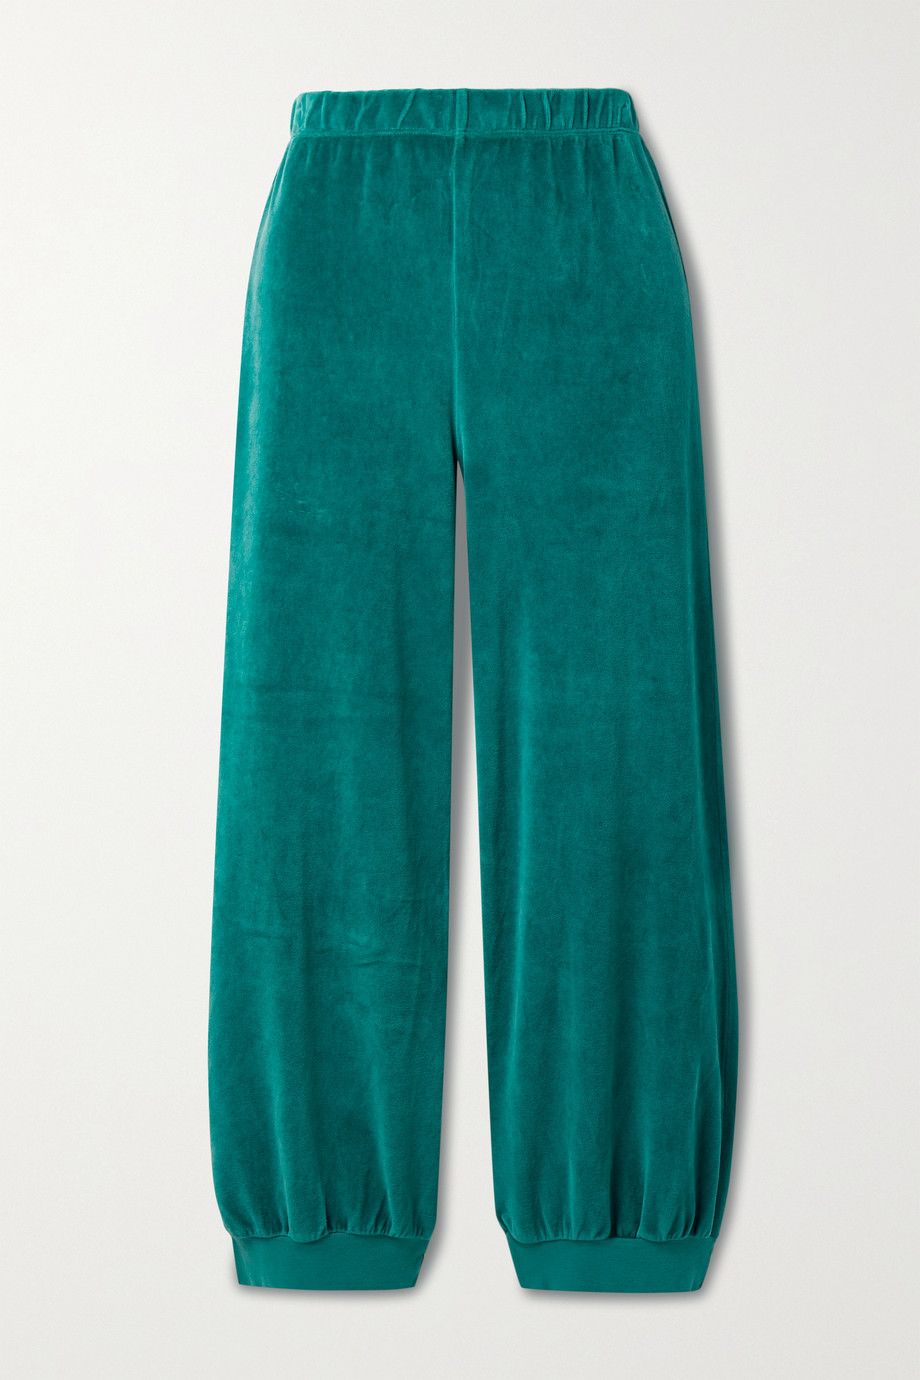 Suzie Kondi Cropped cotton-blend velour track pants